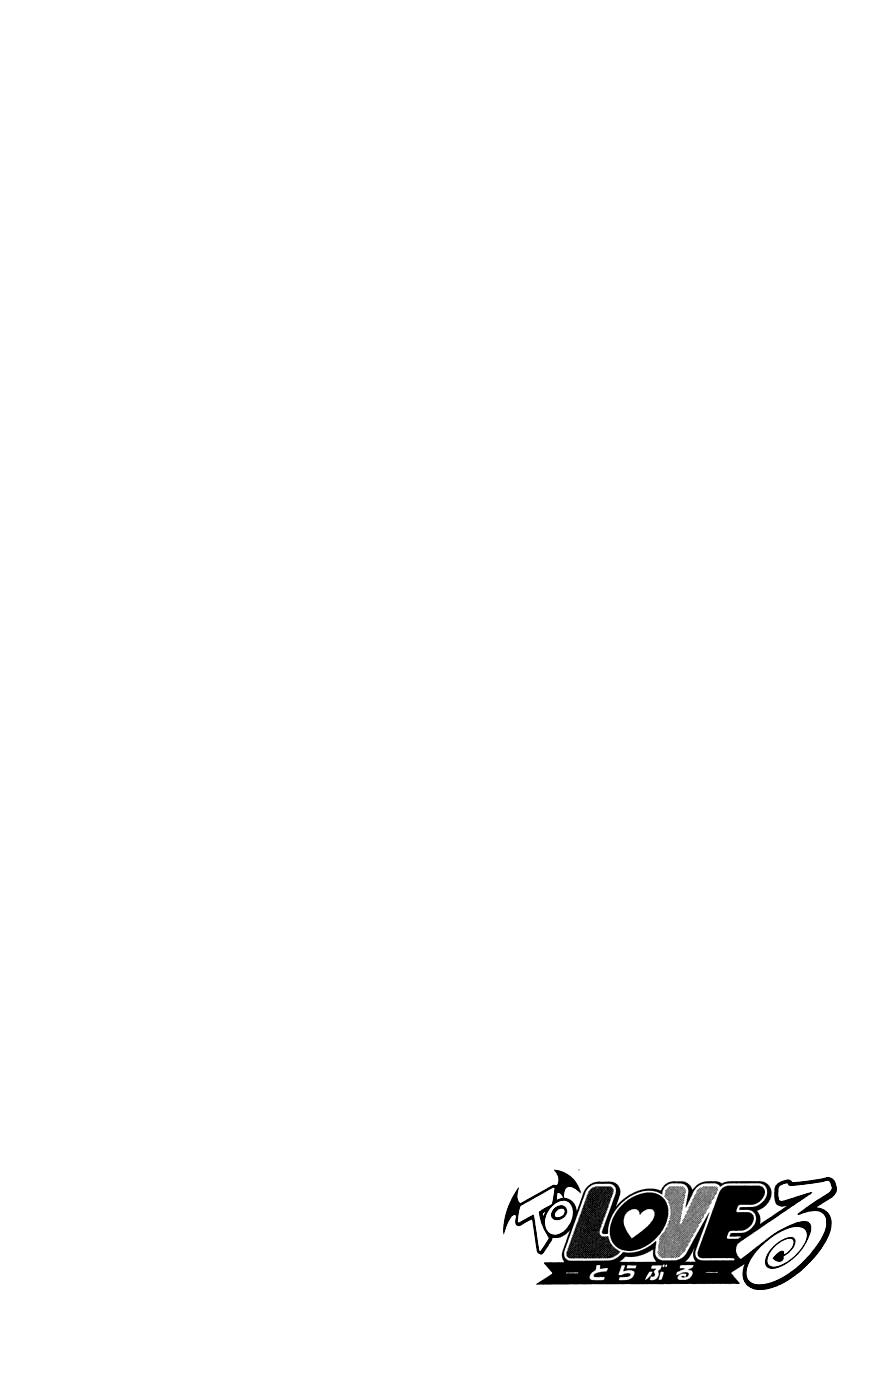 Манга Любовные неприятности / To Love-Ru  - Том 6 Глава 49 Страница 23